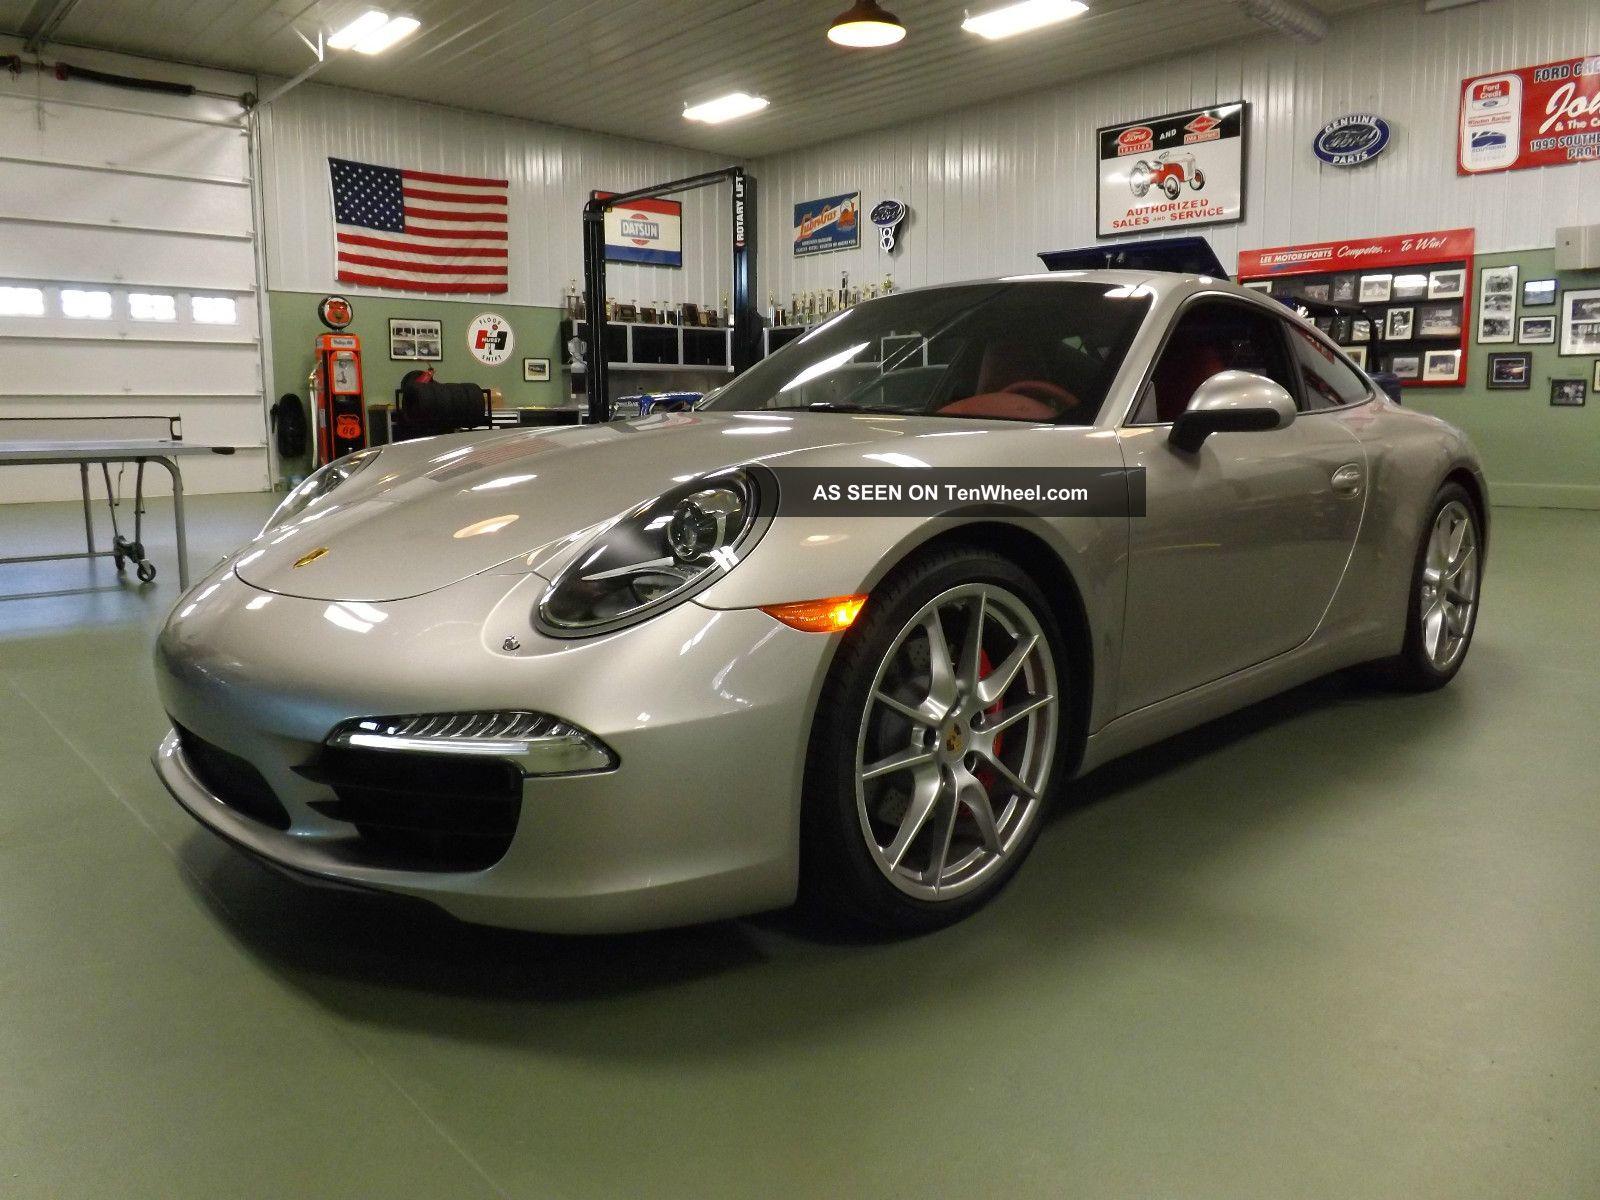 2012 Porsche 911 Carrera S Coupe 911 photo